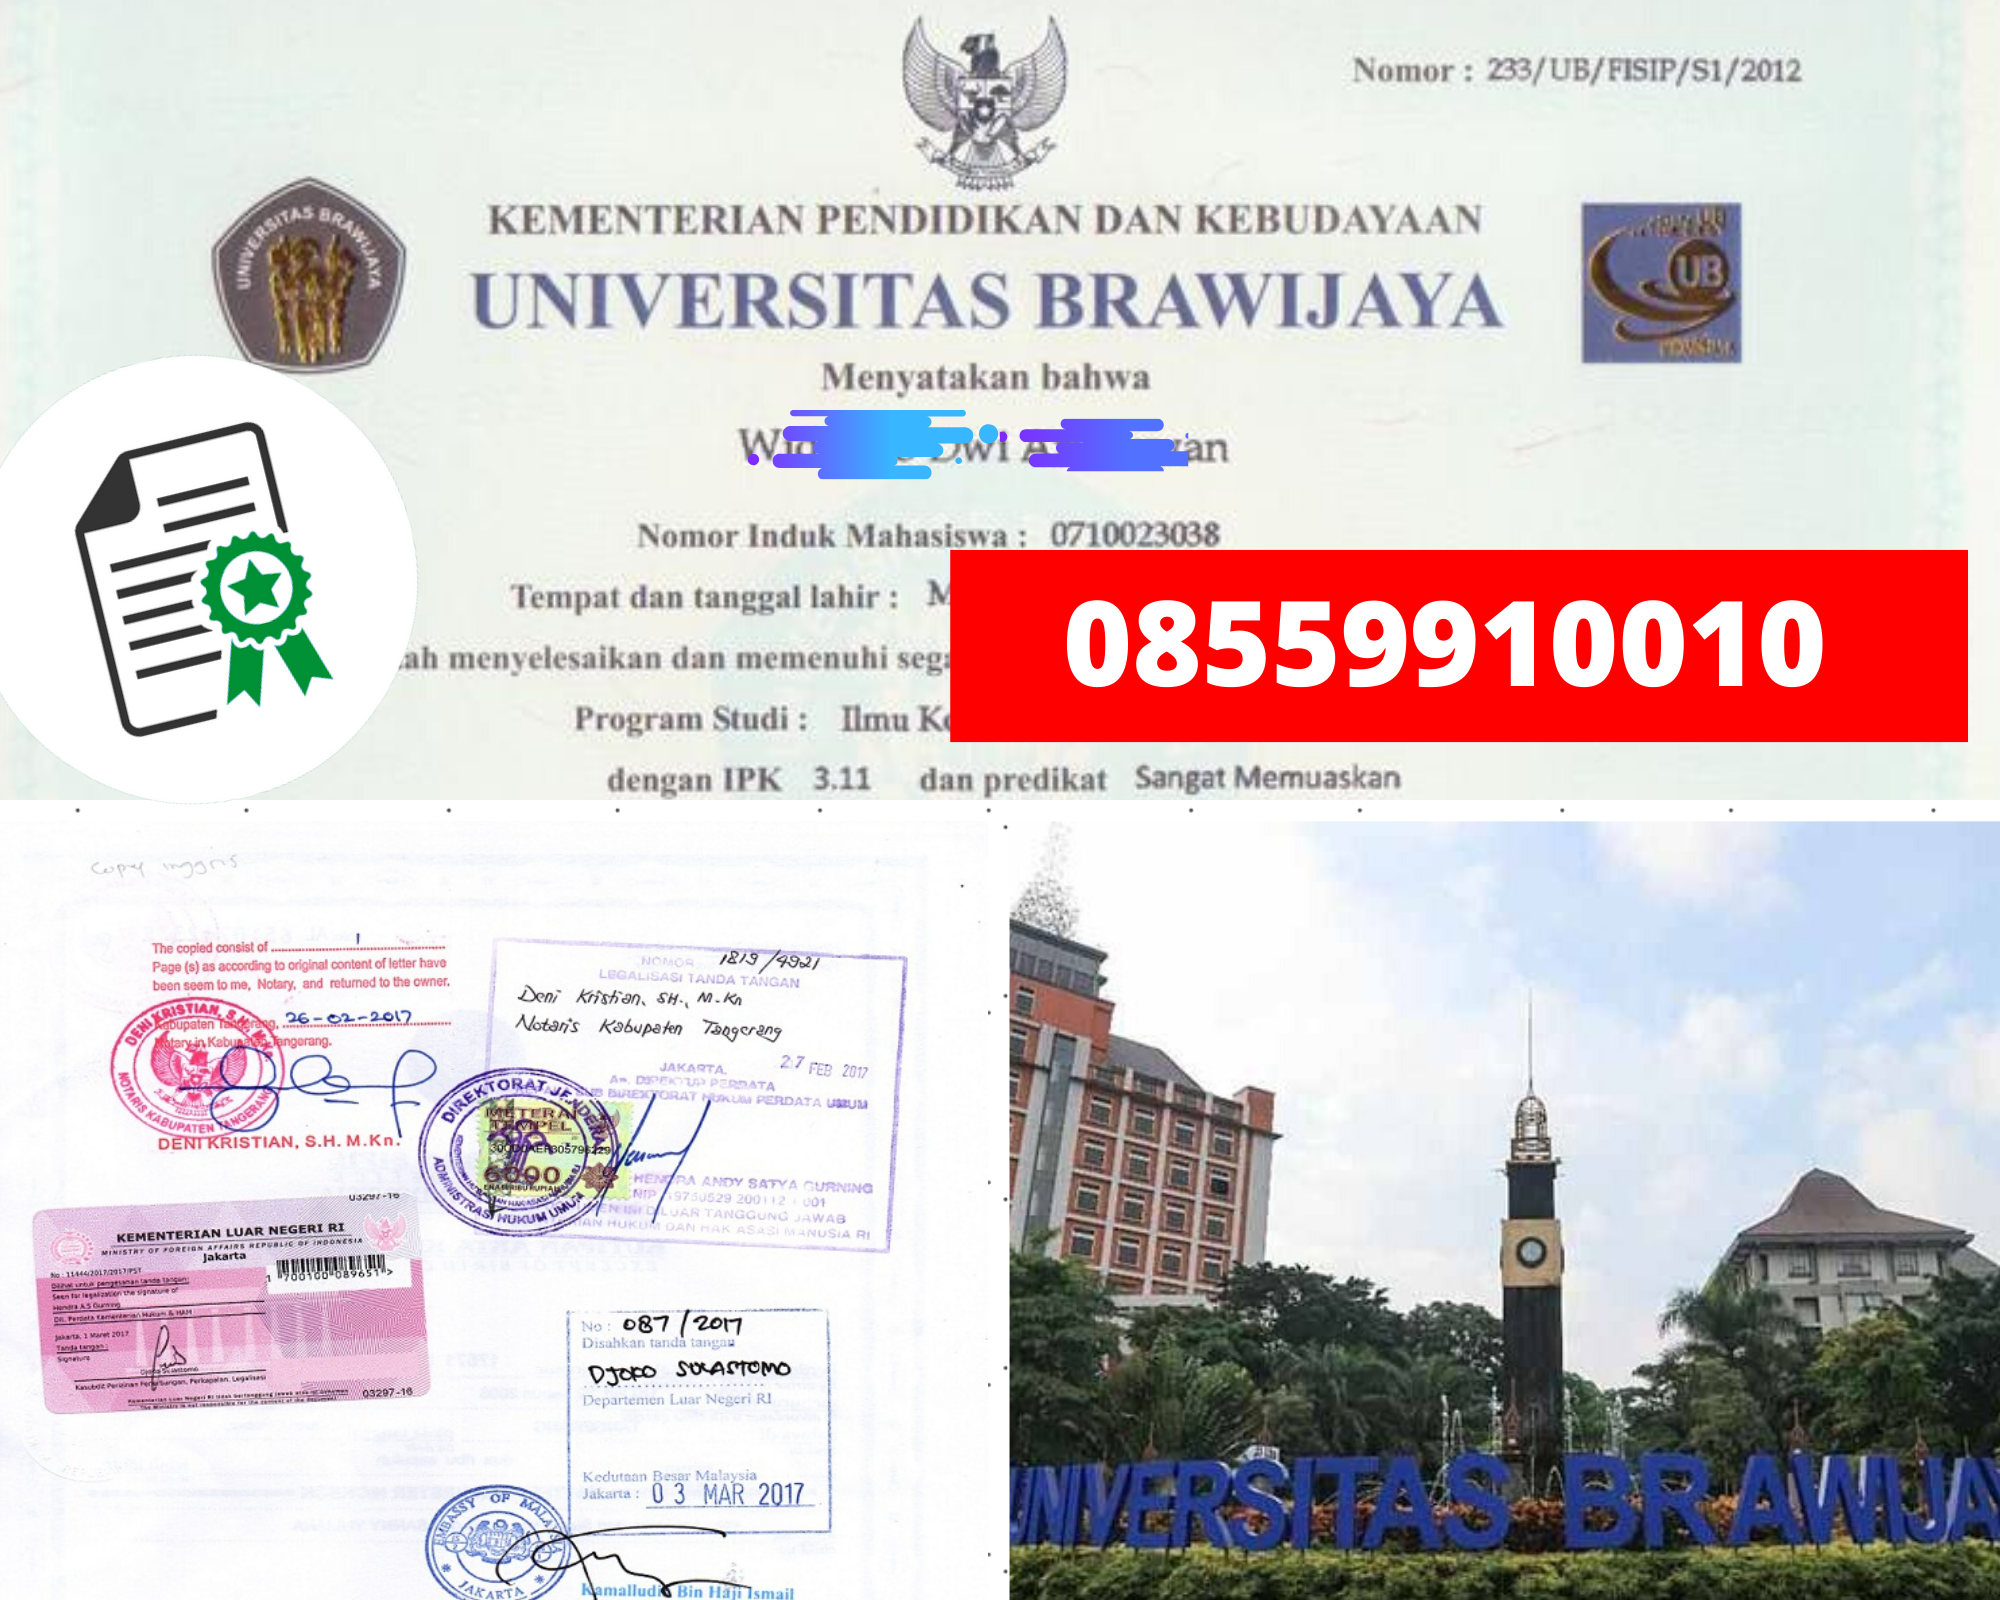 Legalisir Ijazah Universitas Brawijaya Di Kemenristek Dikti || 08559910010